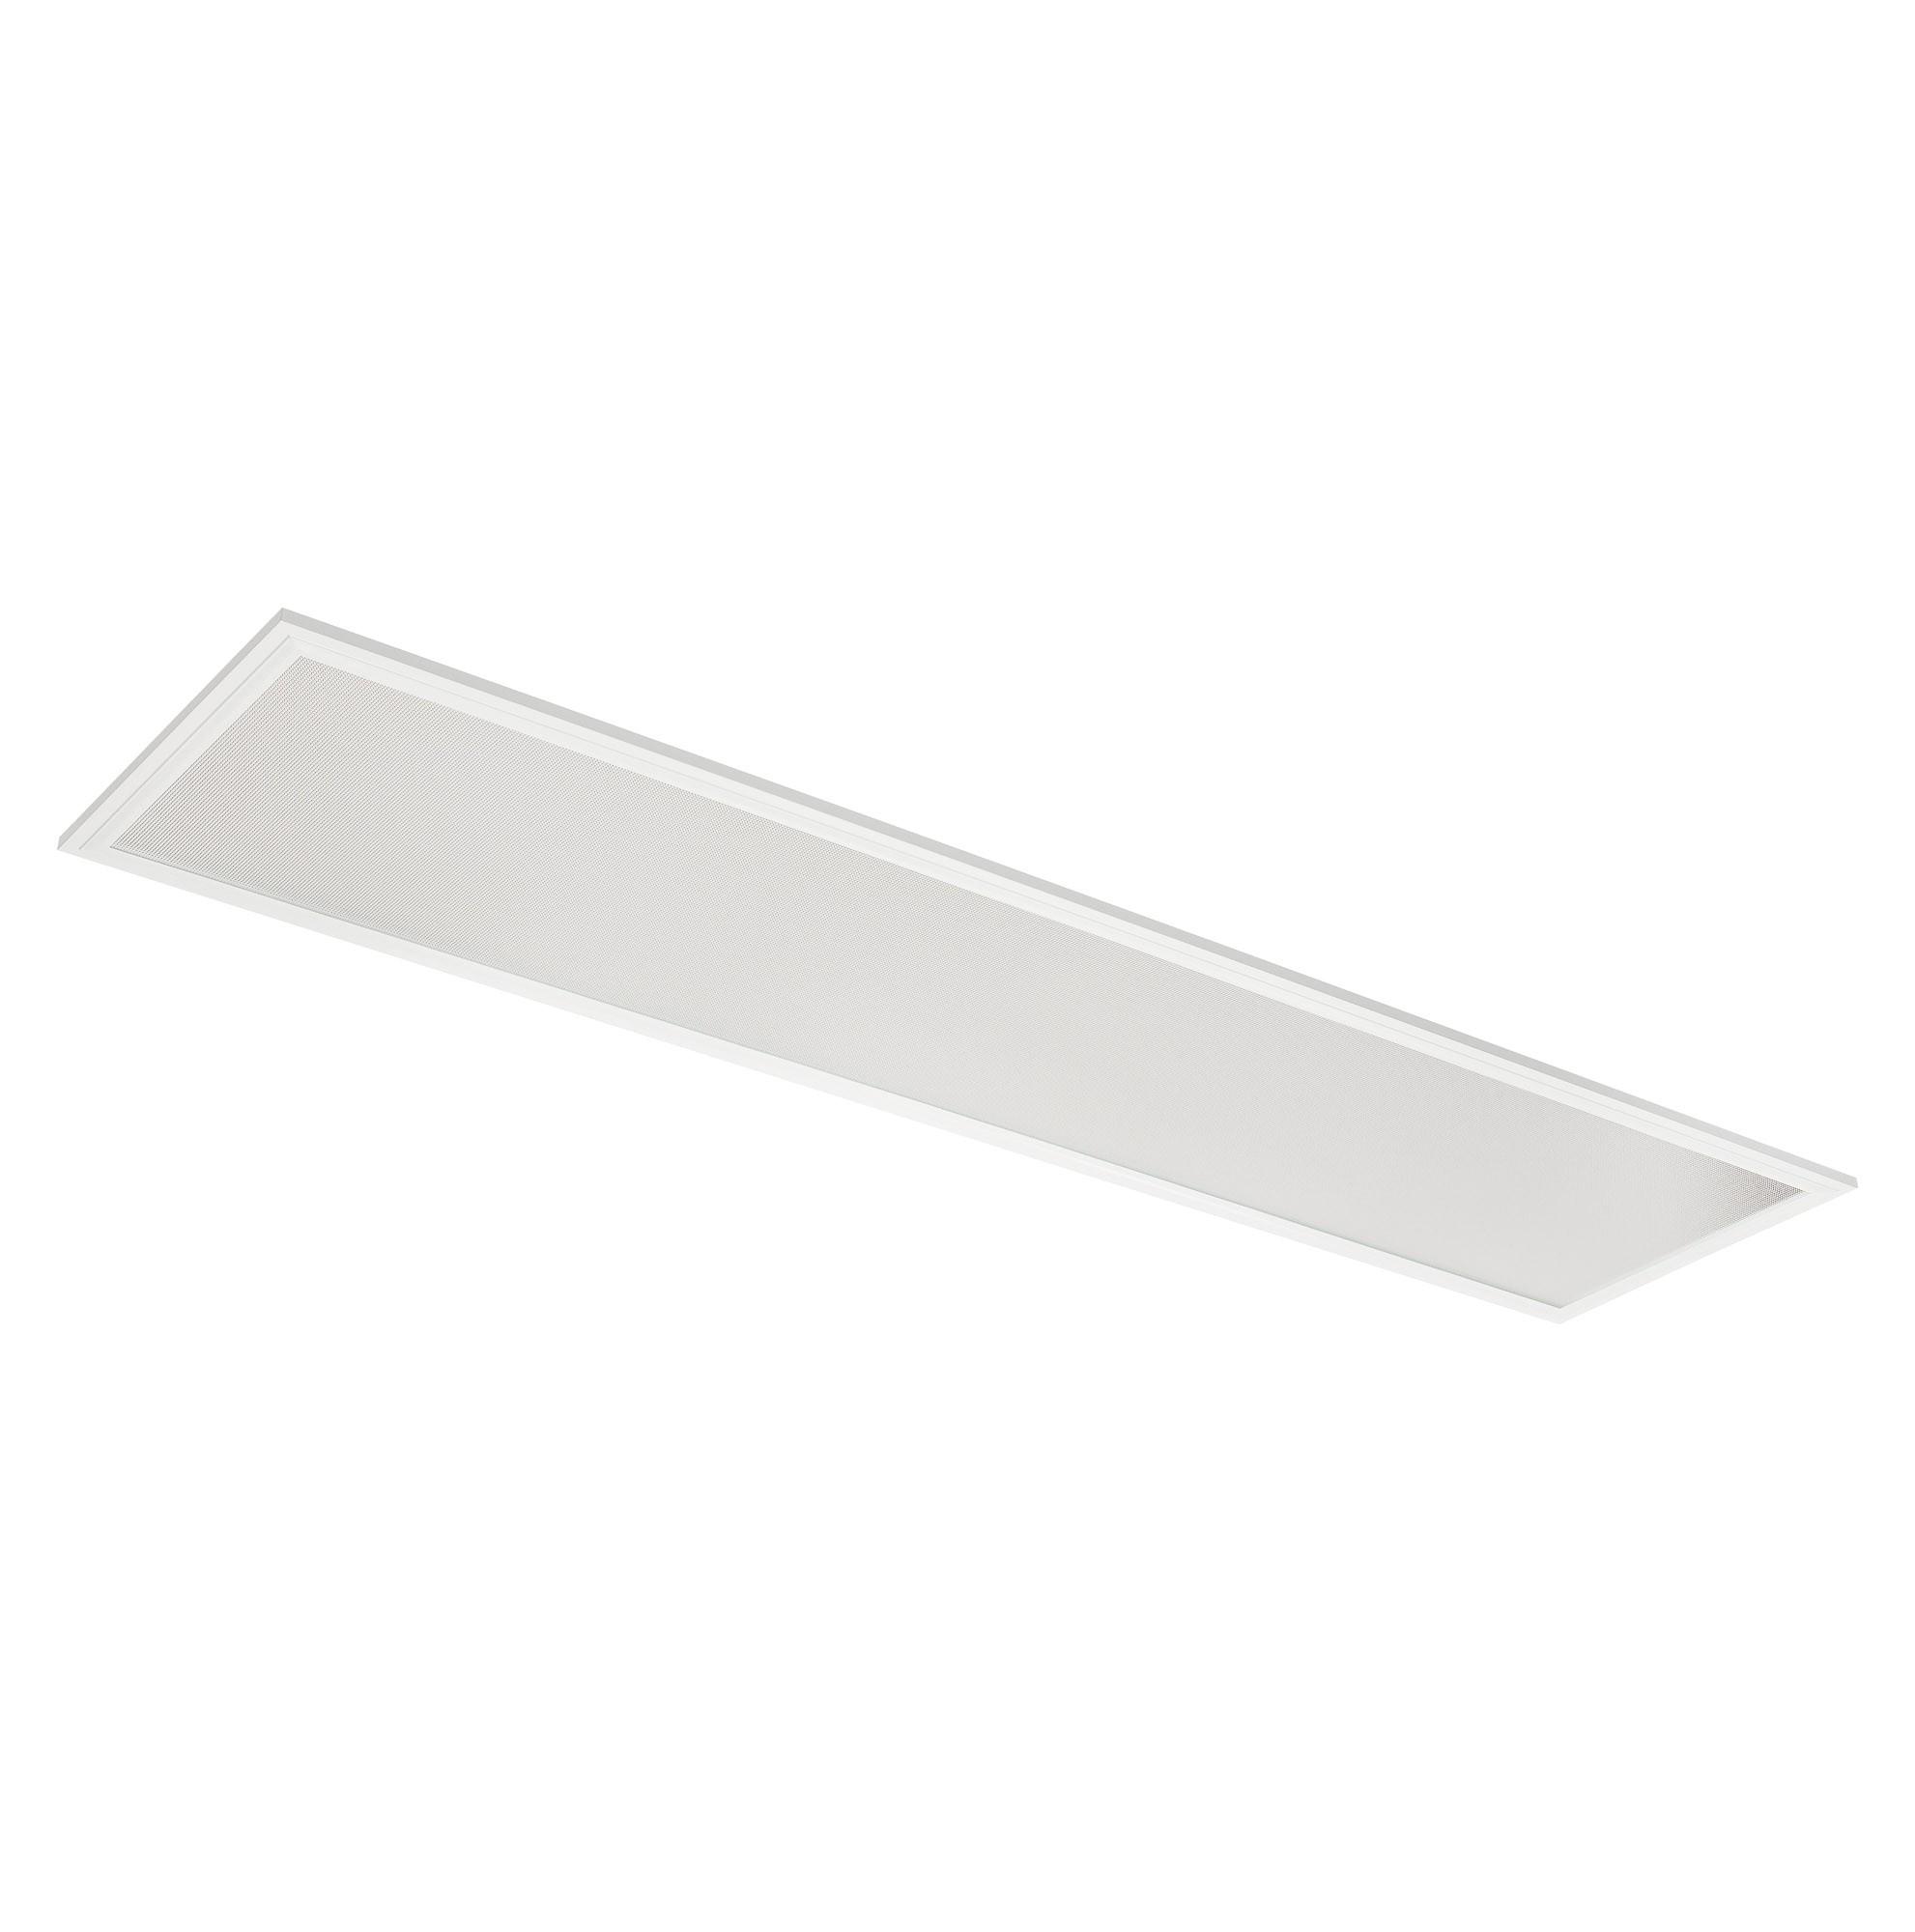 UGR<19 - LOW GLARE LED PANEL - 36W - 1200mm X 300mm - 4000K